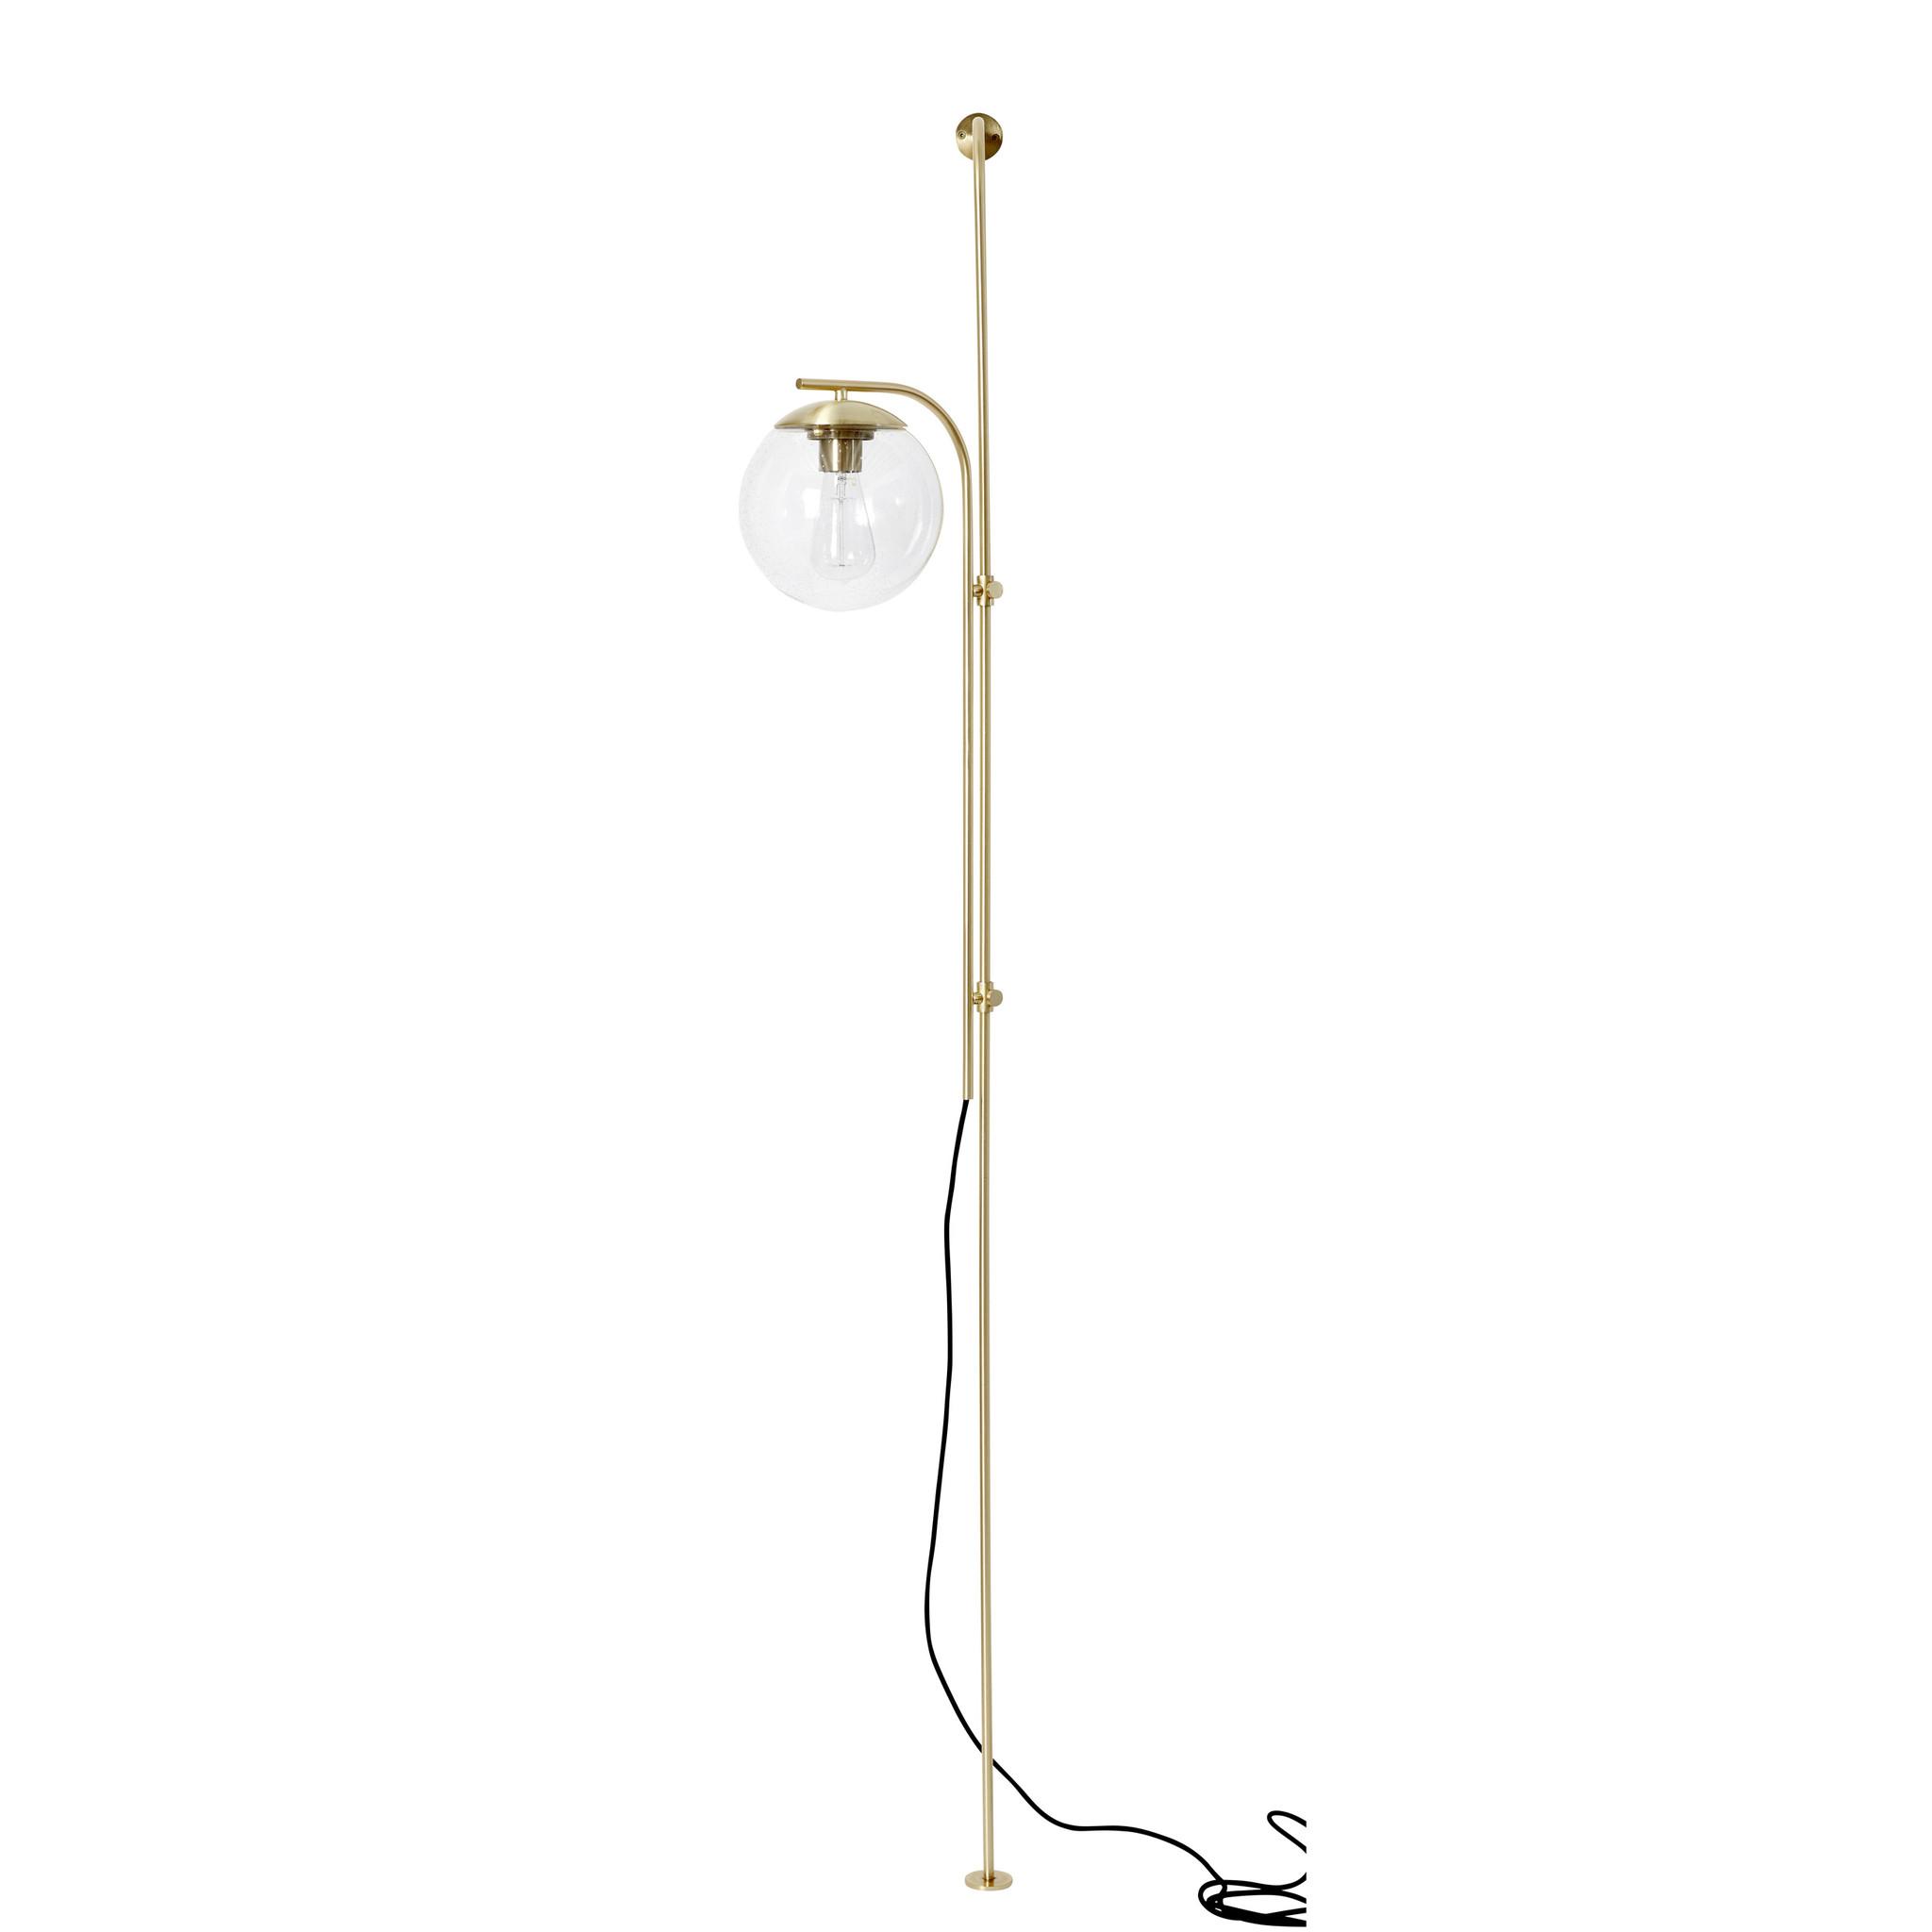 Hubsch Wand lamp metaal/glas-991210-5712772102374